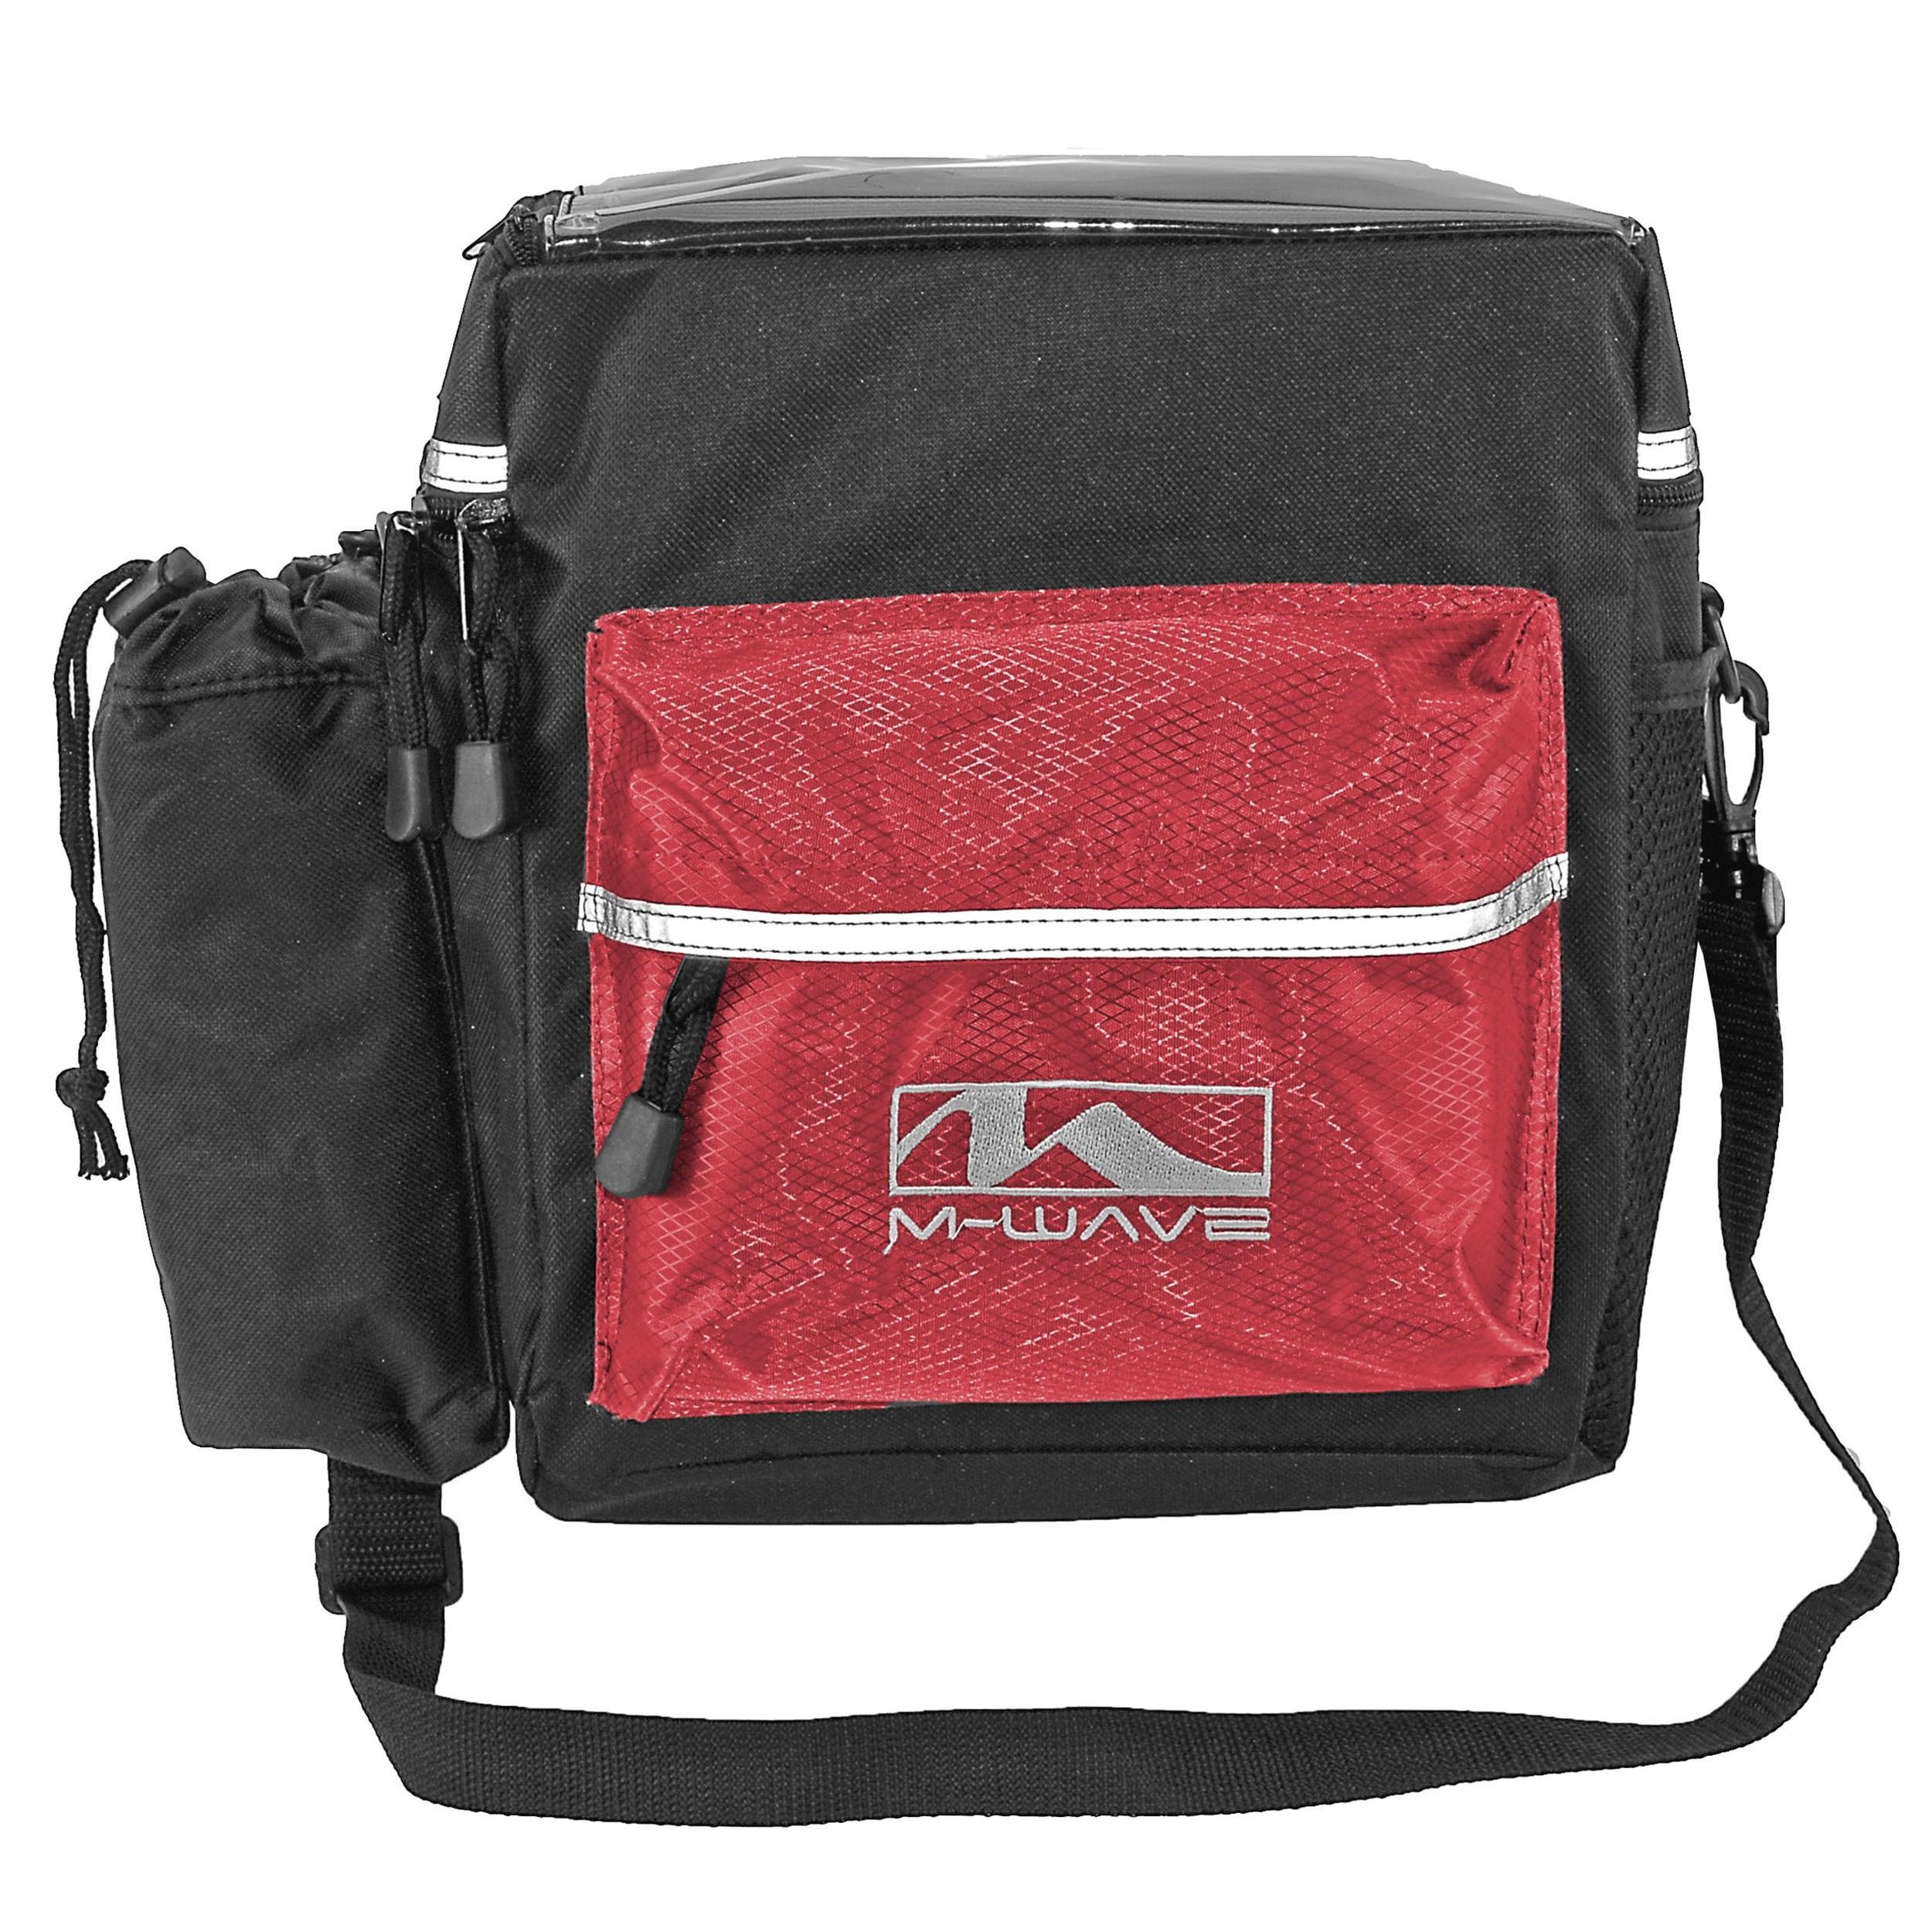 M-Wave Utrecht Handlebar Bicycle Bag (Black/Red)